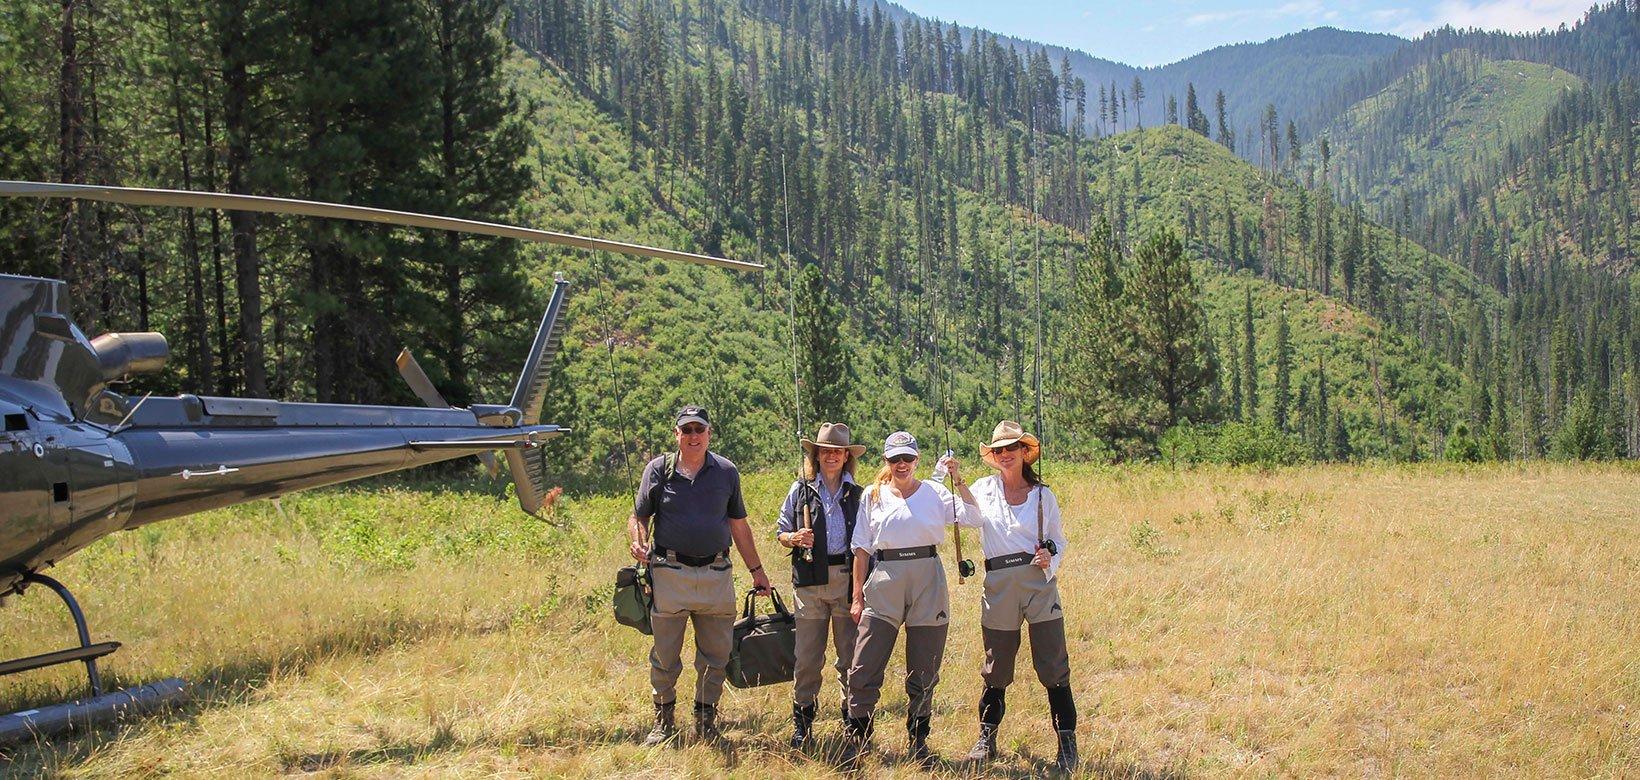 A heli-fishing adventure at The Ranch at Rock Creek